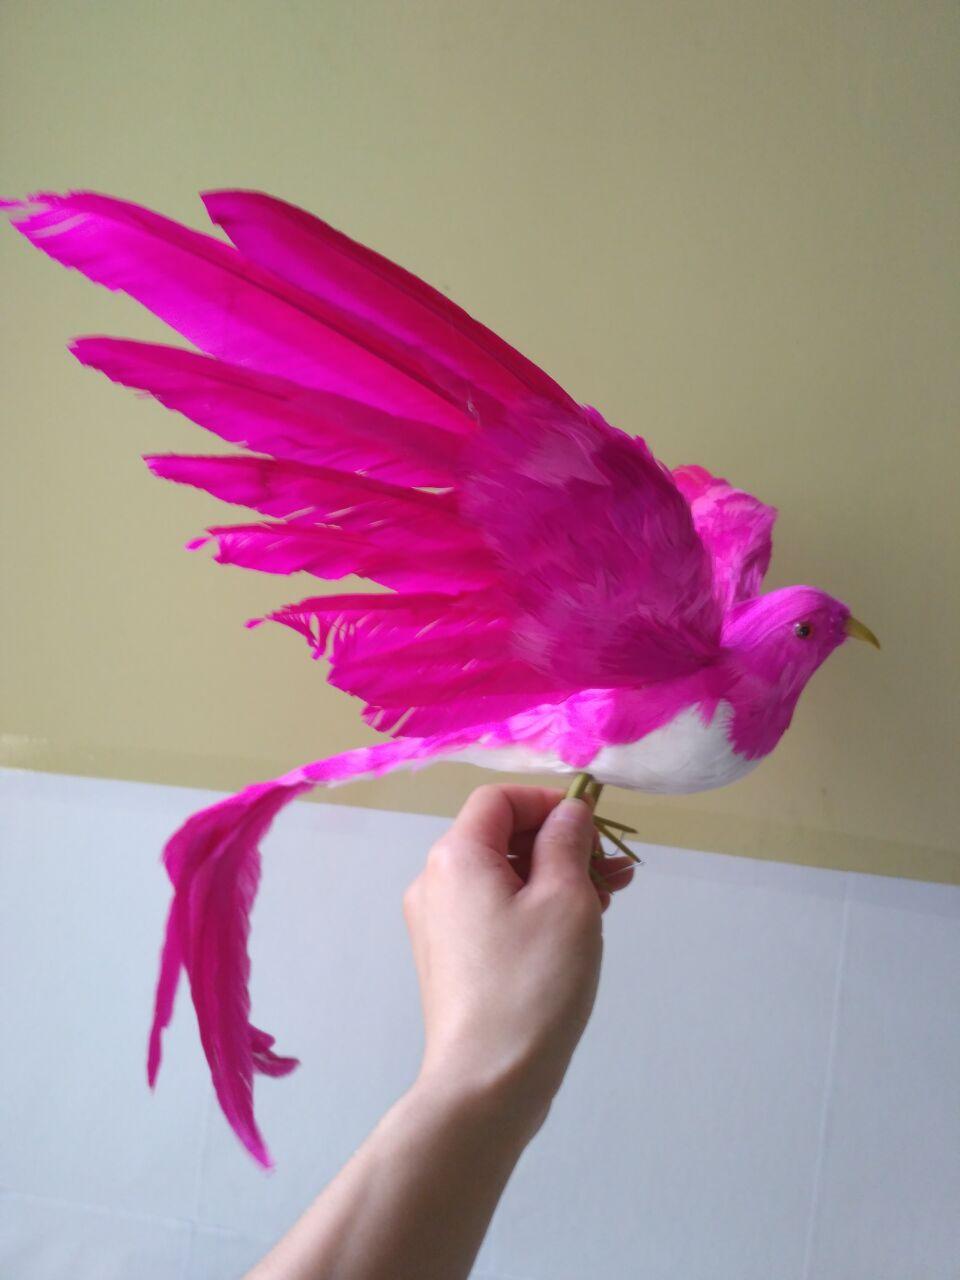 Details about  /4Pcs Decorative Colorful Artificial Feathered Birds Figurine Sculpture